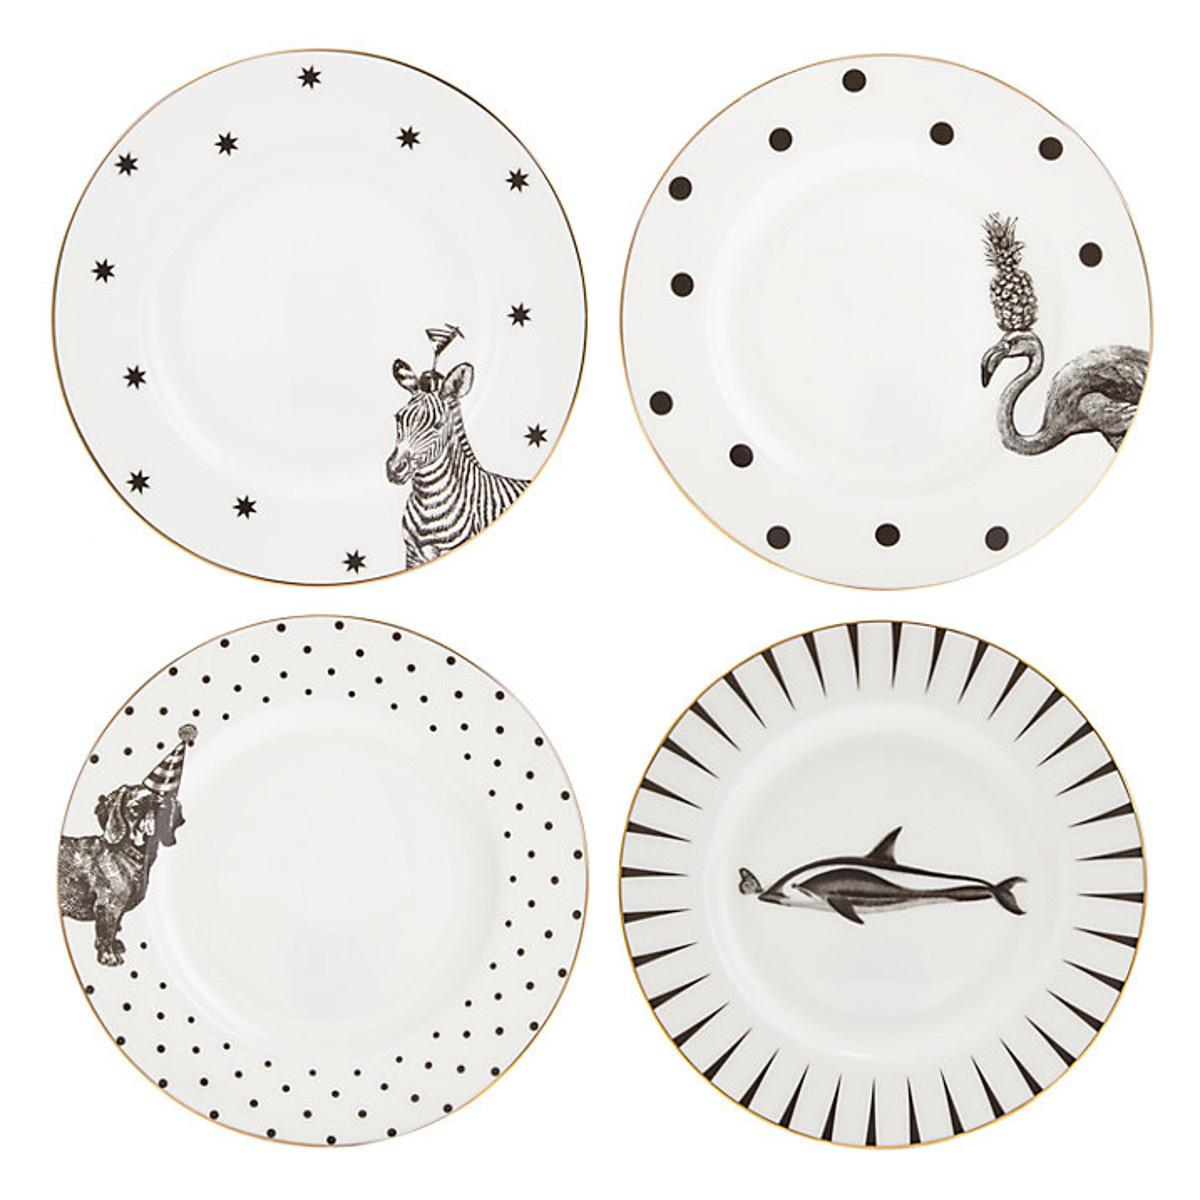 Yvonne Ellen London Monochrome Set van 2 Borden Ø 16 cm - Zebra - Bone China Porseleinint - Bone China Porselein